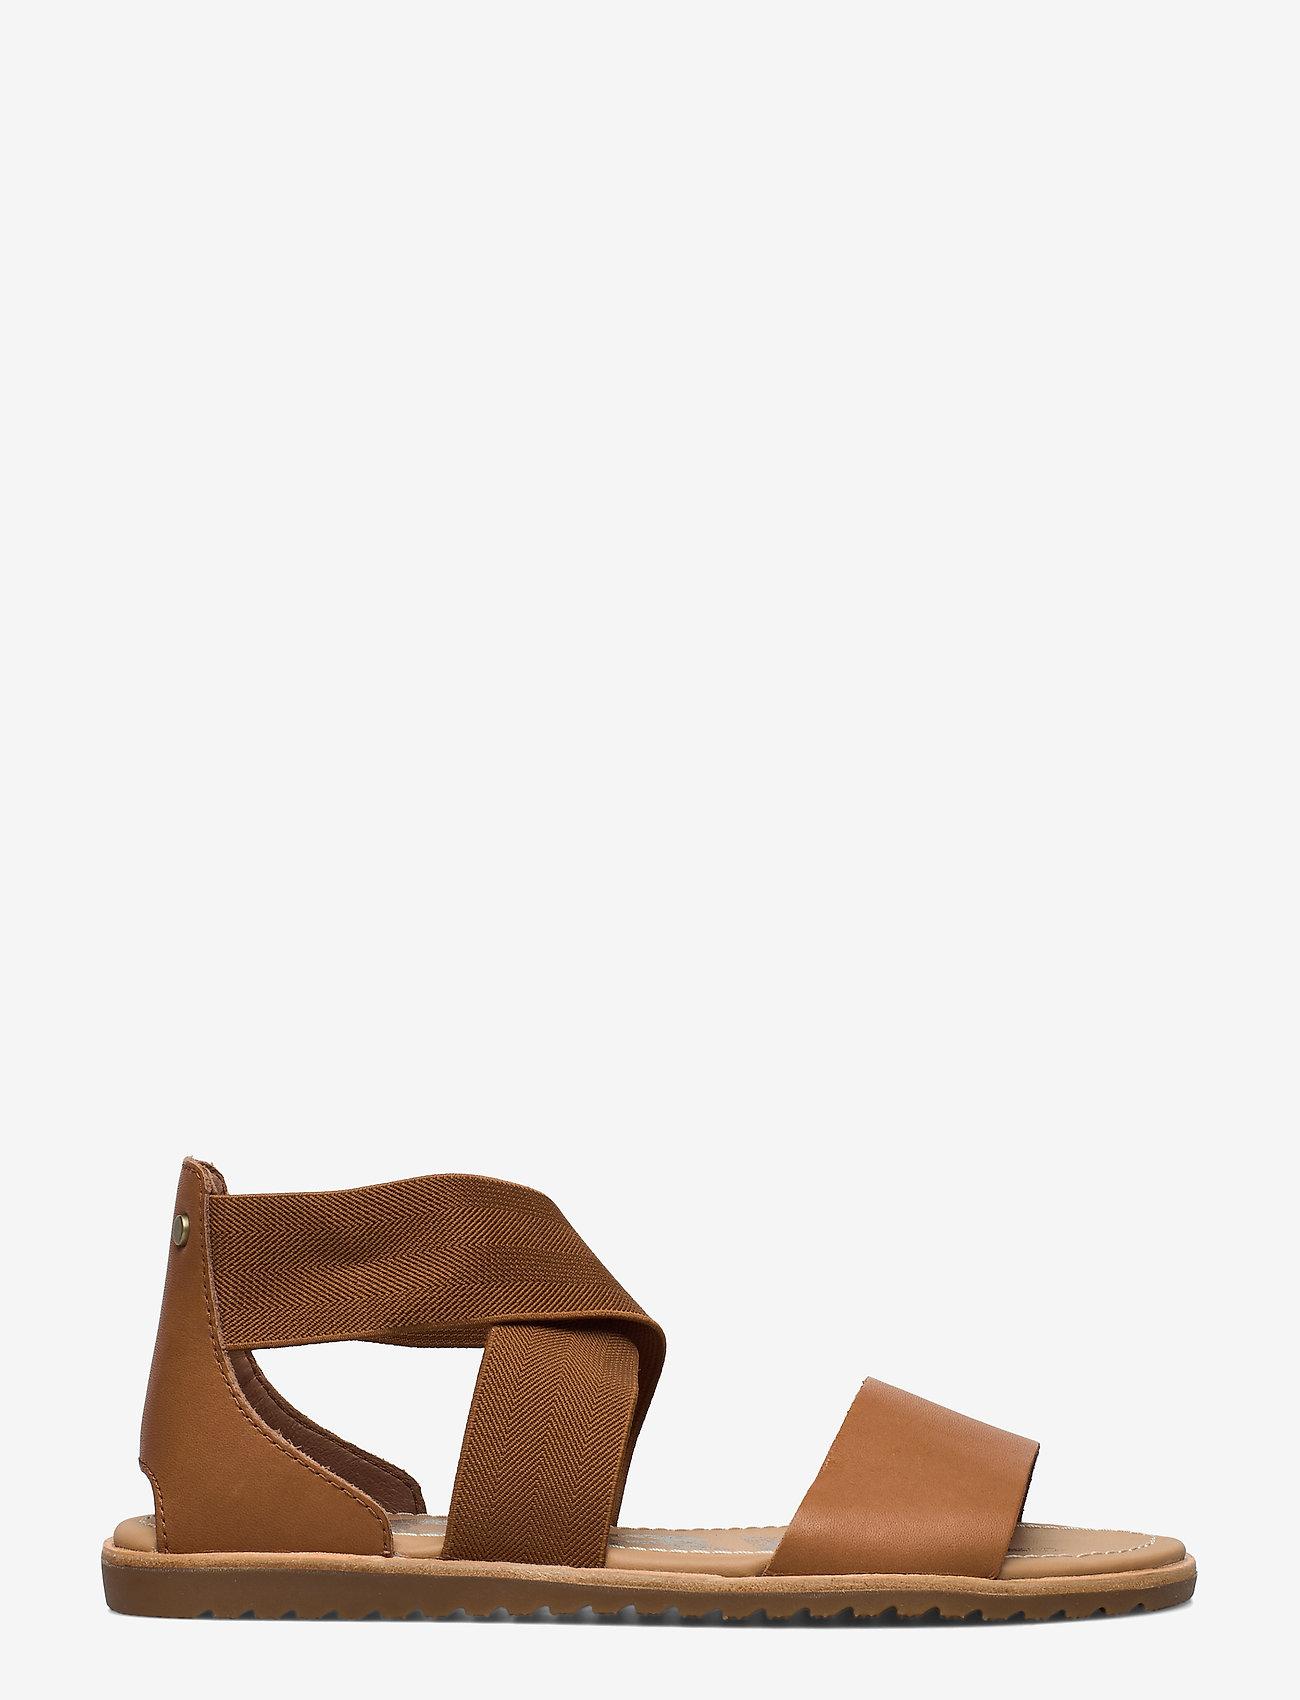 Ella™ Sandal (Camel Brown) (45